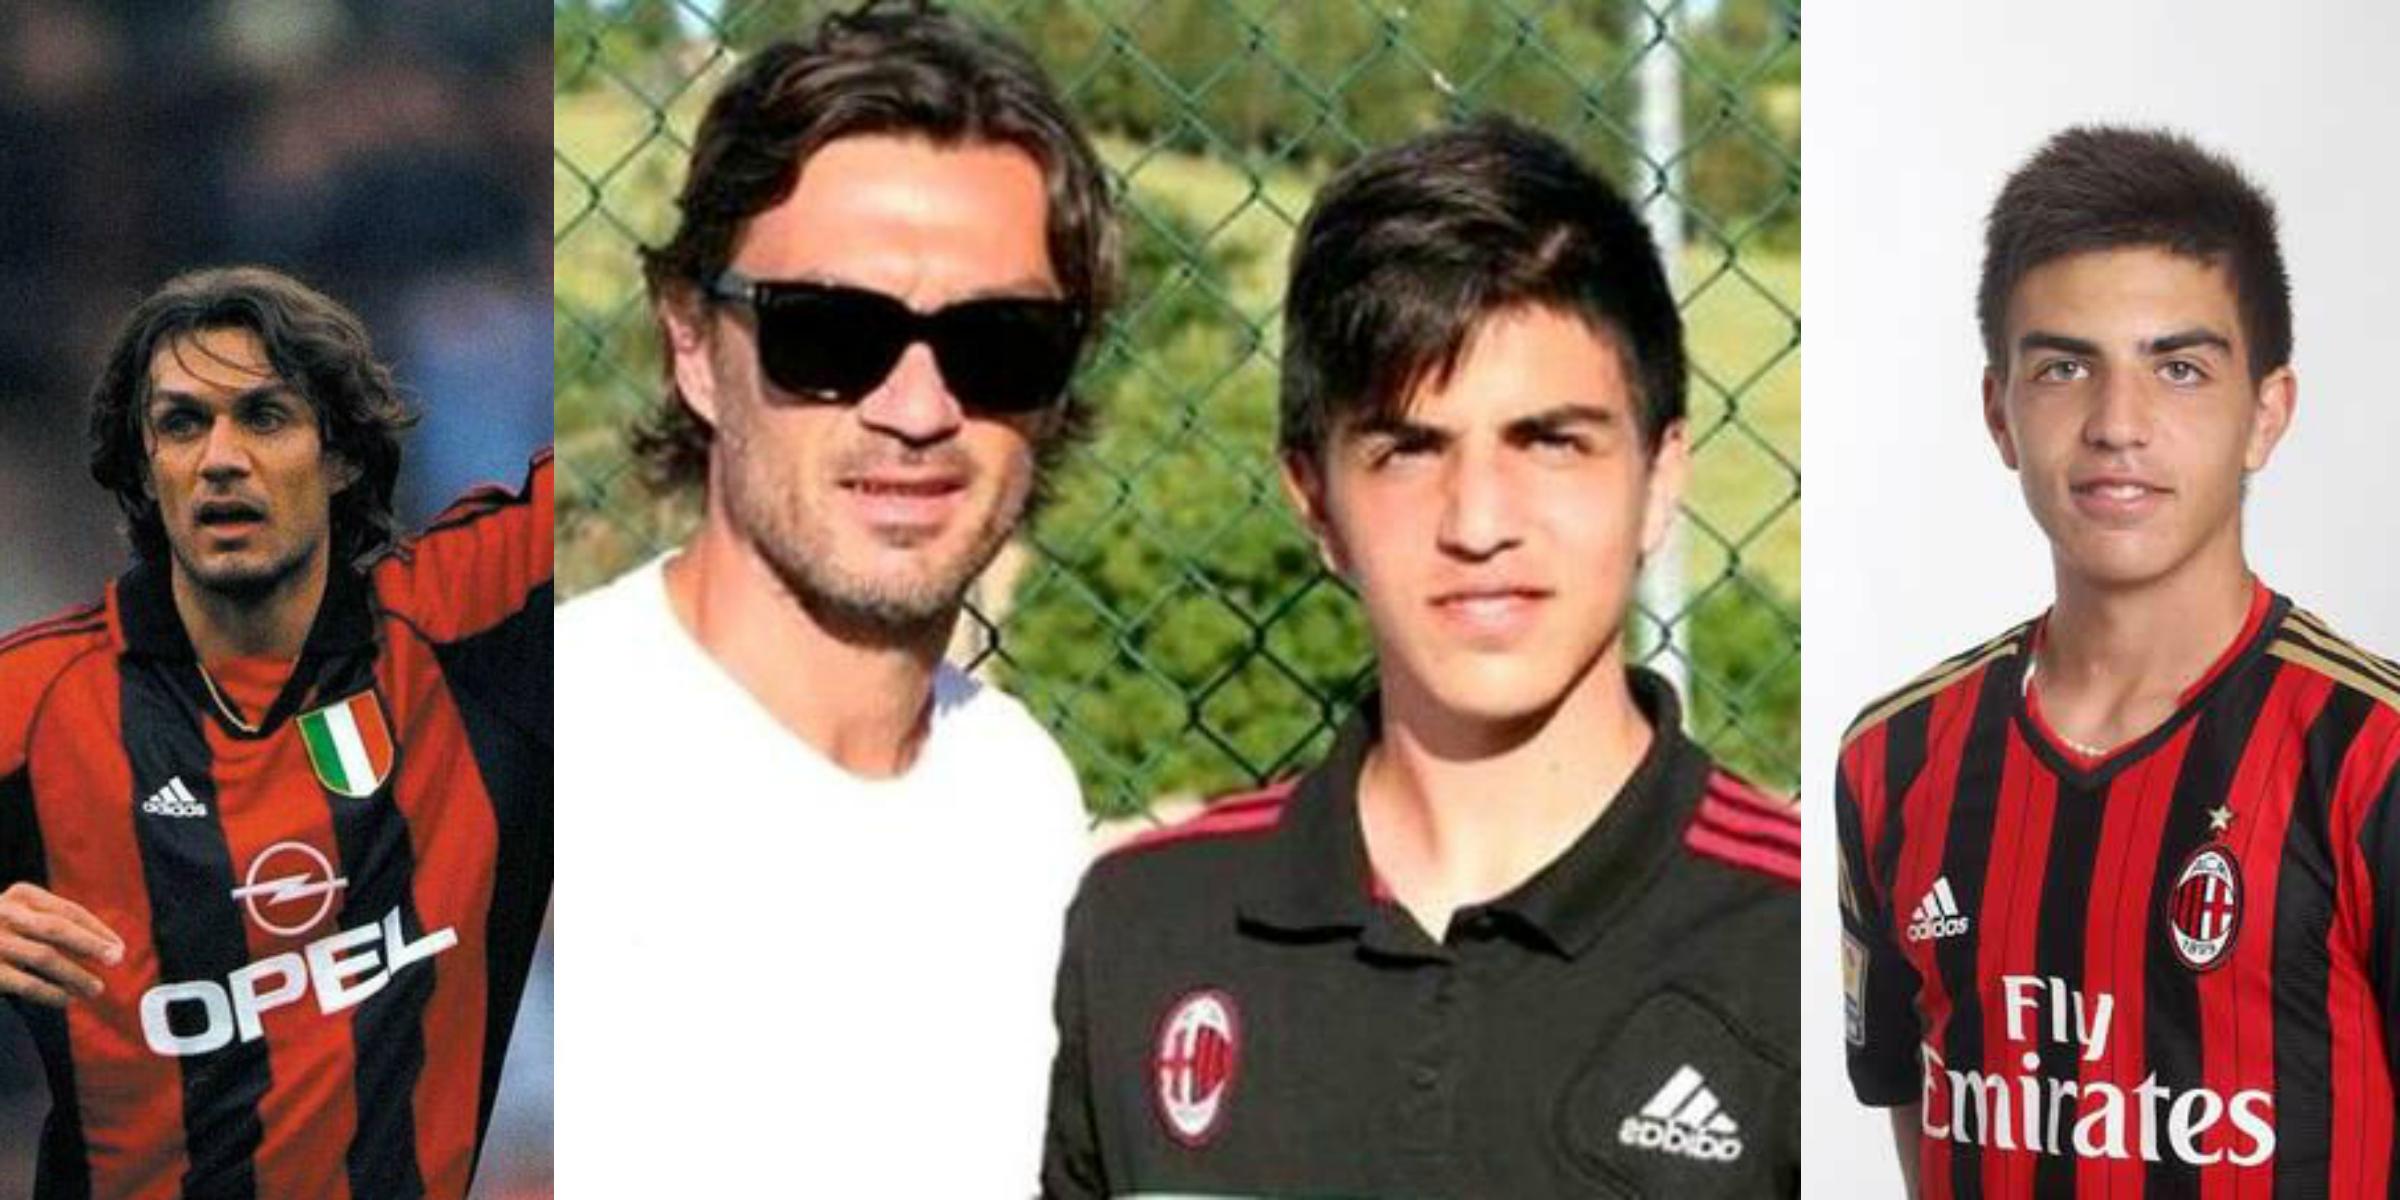 Paolo Maldini and Christian Maldini